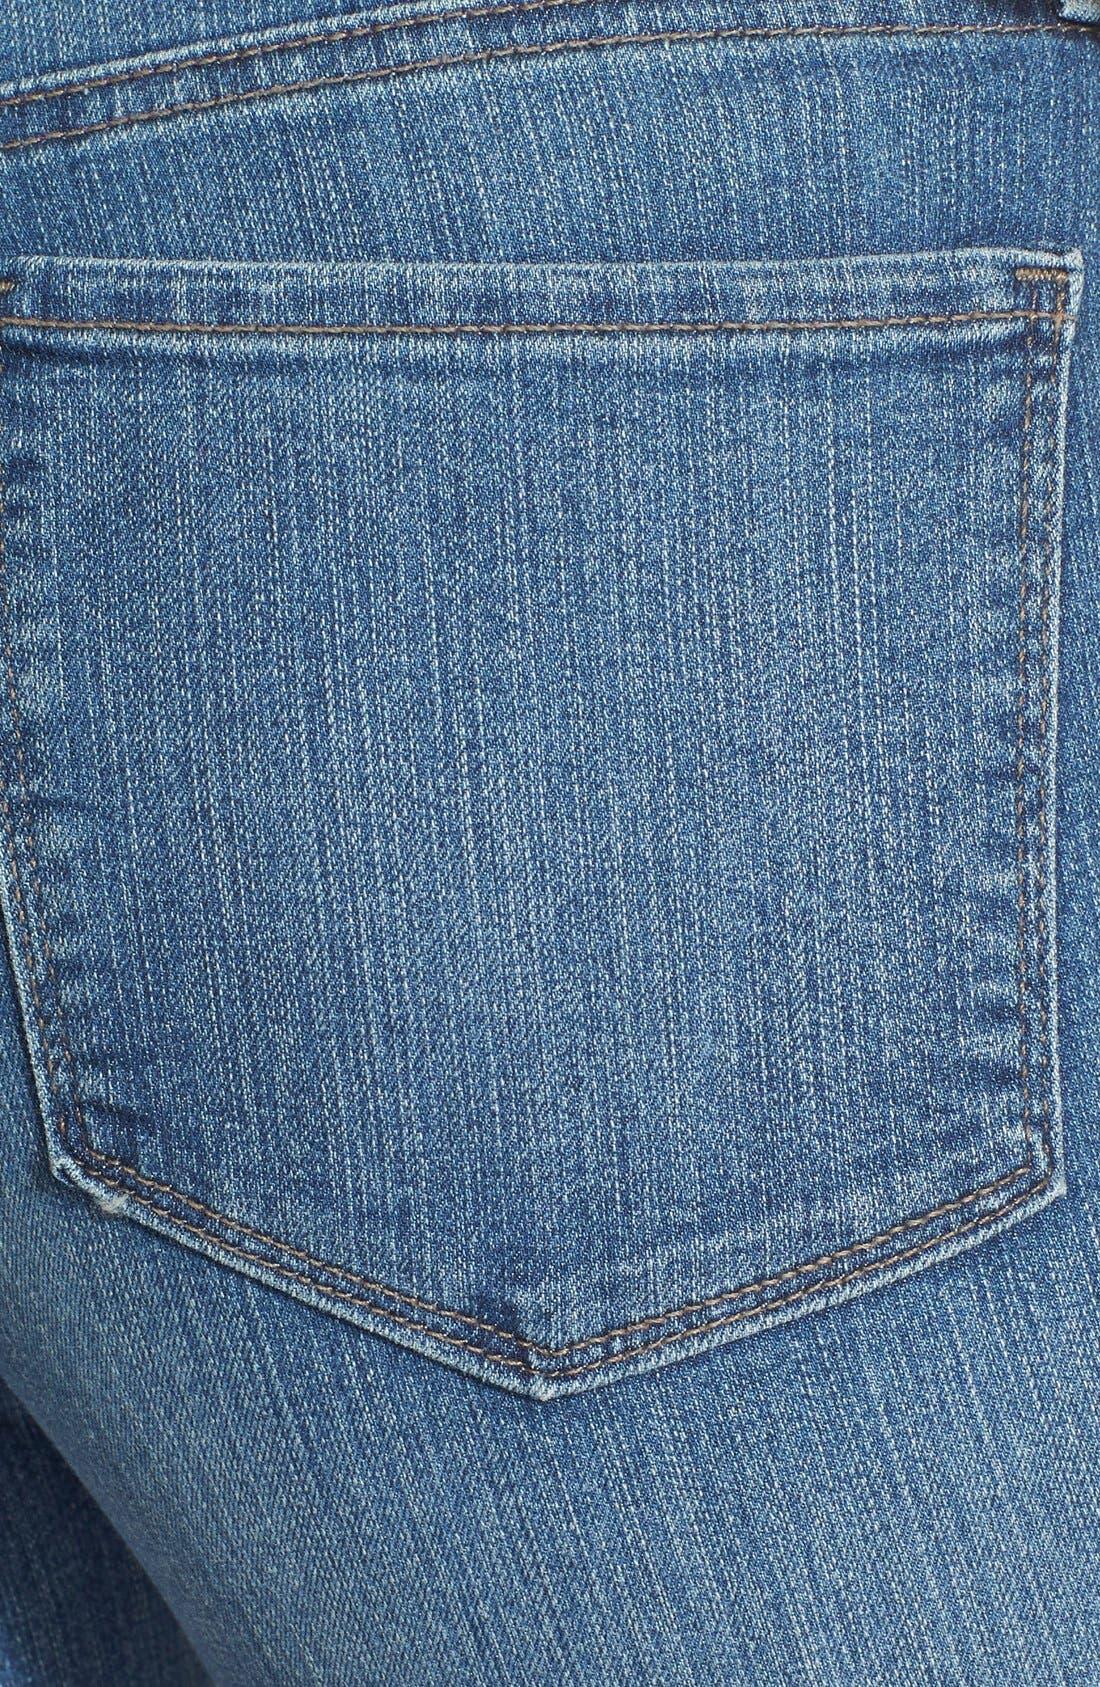 Alternate Image 3  - NYDJ 'Ami' Stretch Super Skinny Jeans (Bellevue)